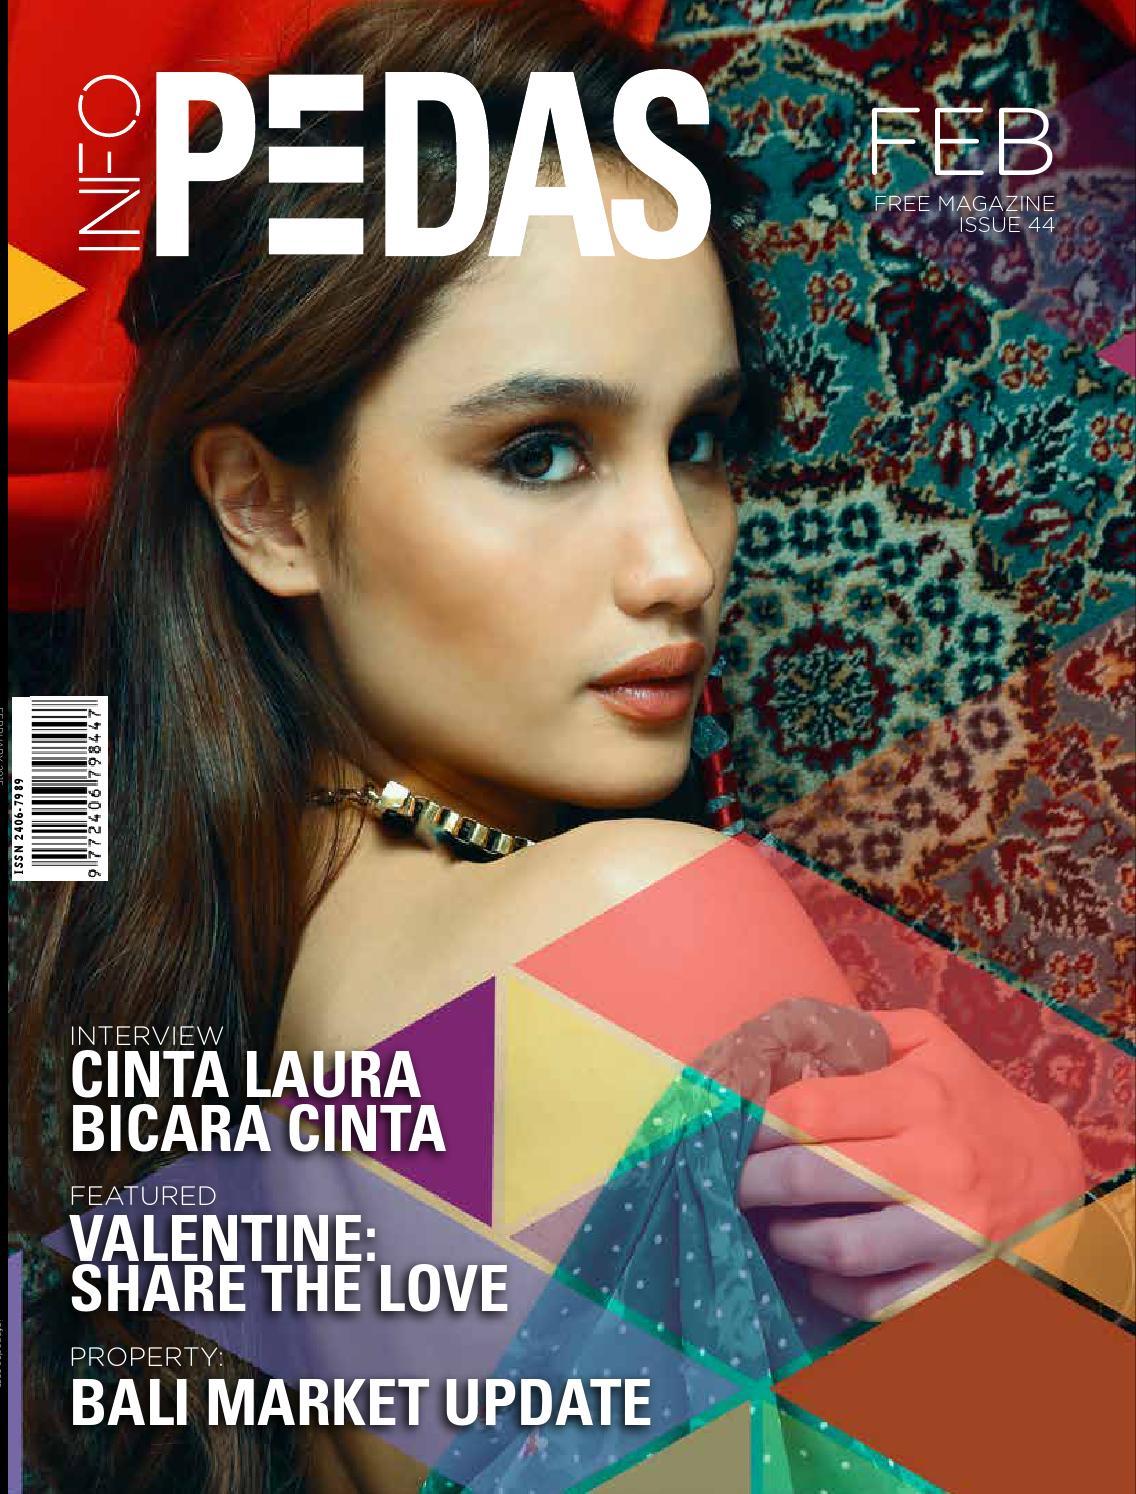 Majalah Infopedas Edisi 41 By Pedas Issuu E Voucher 200 Double Point Sticker Tiara Gatzu Monang Maning Toko Soputan 44